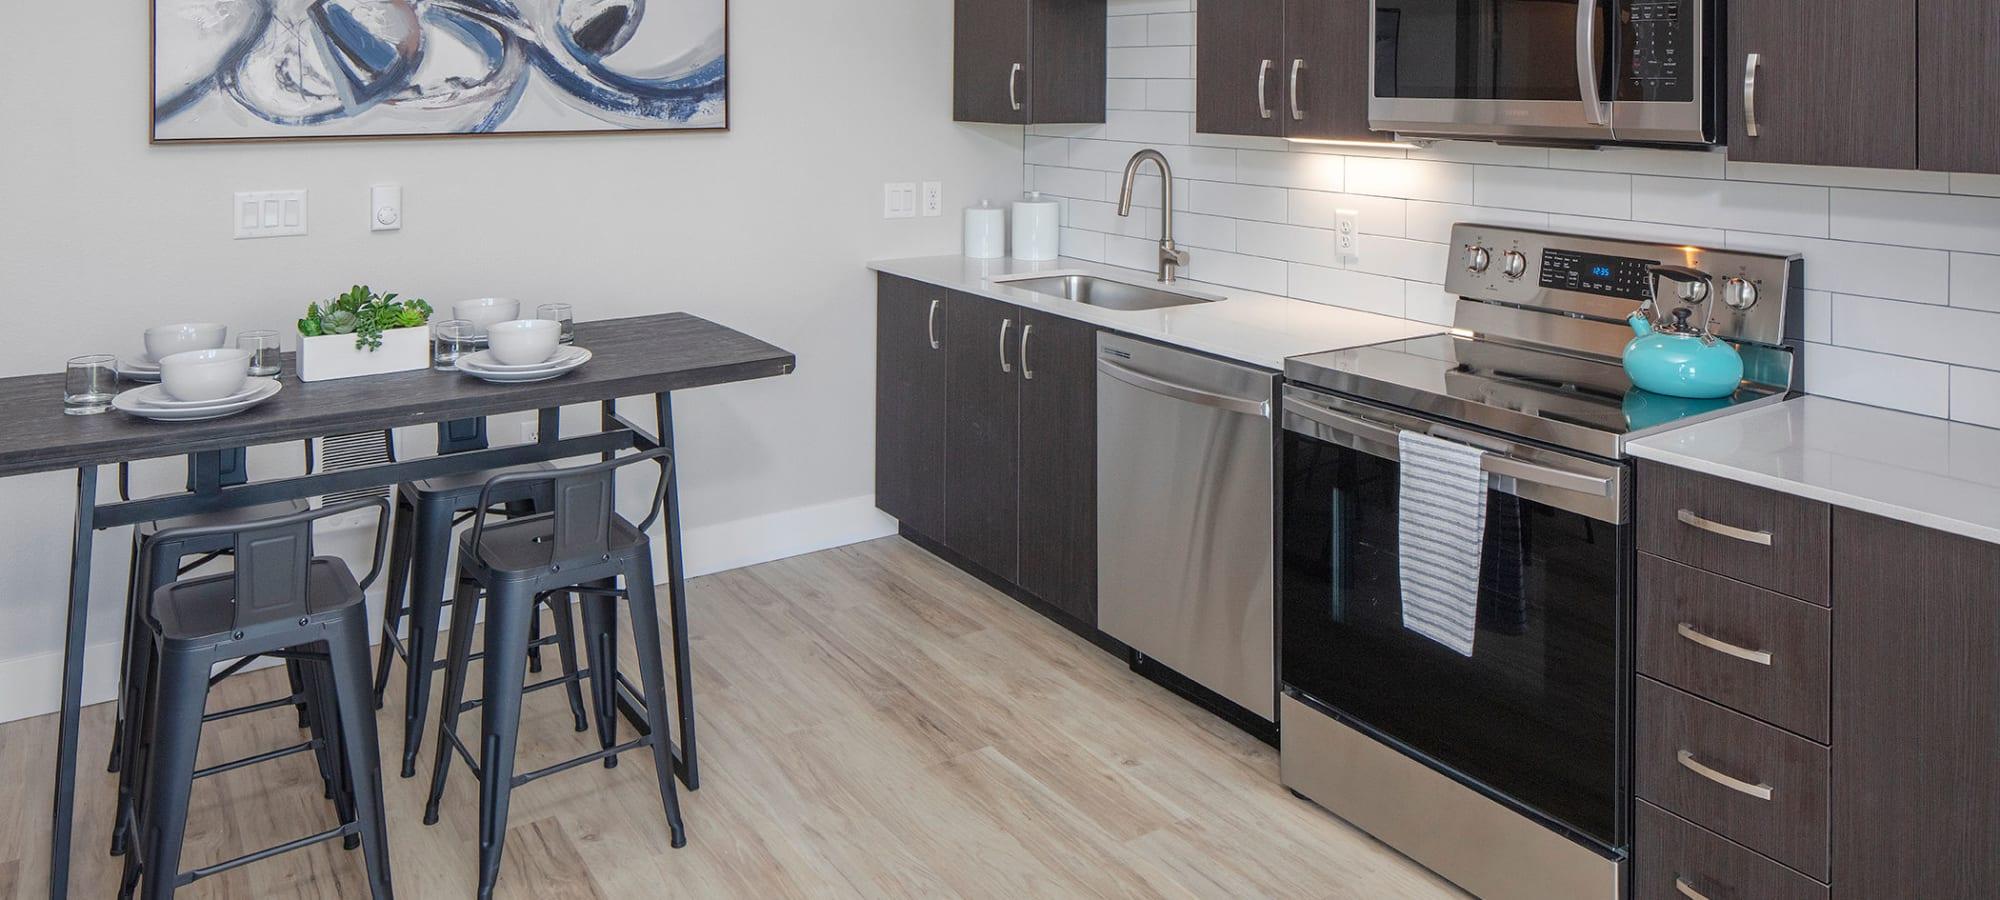 Model kitchen in Gresham, Oregon at Brookside Apartments